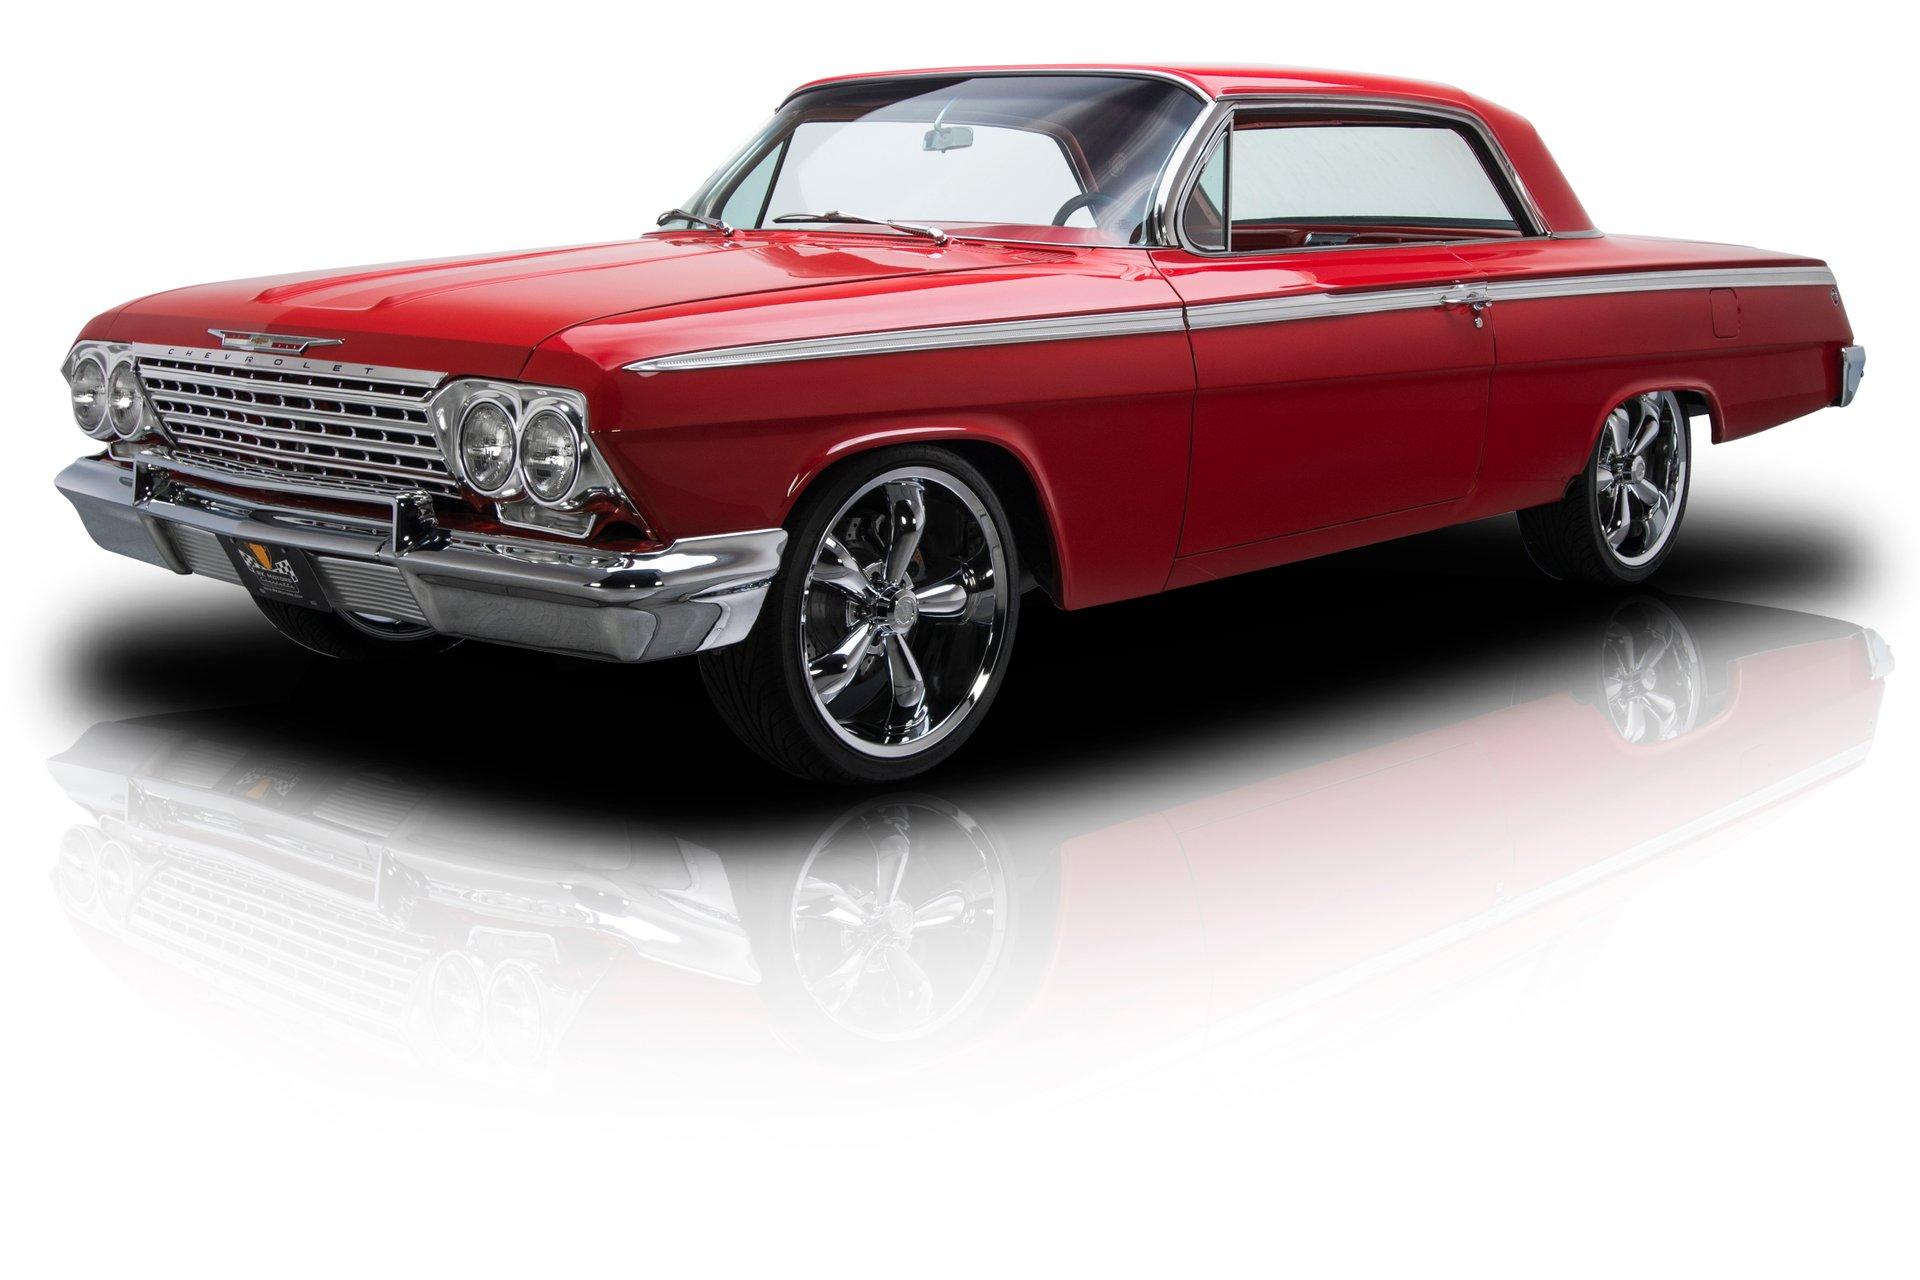 1962 chevrolet impala ss